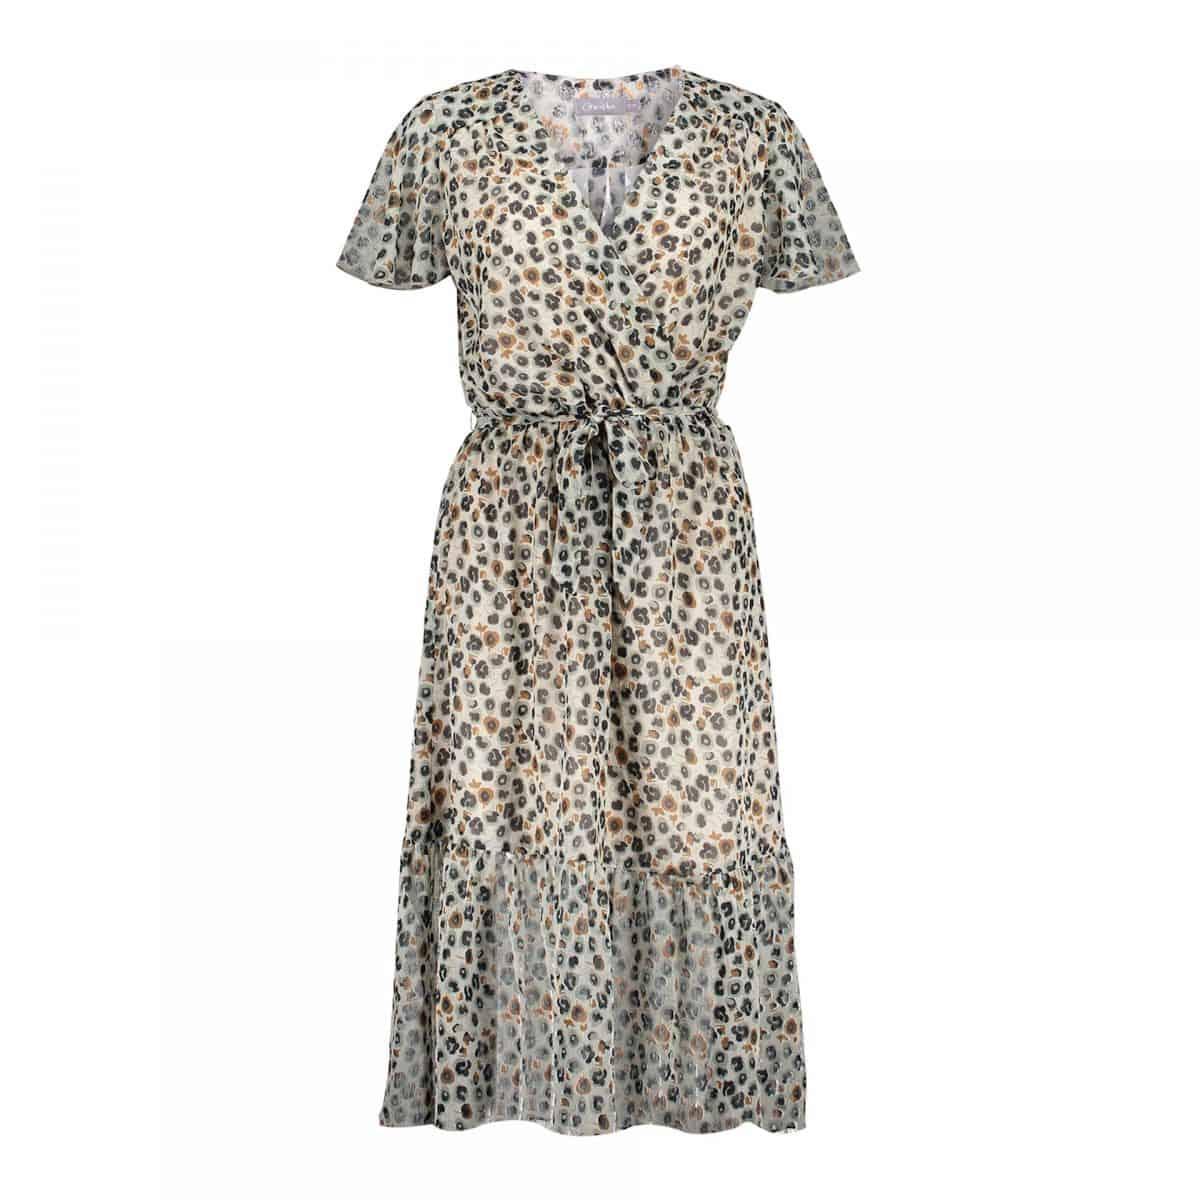 Geisha Dress Chiffon AOP Leopard